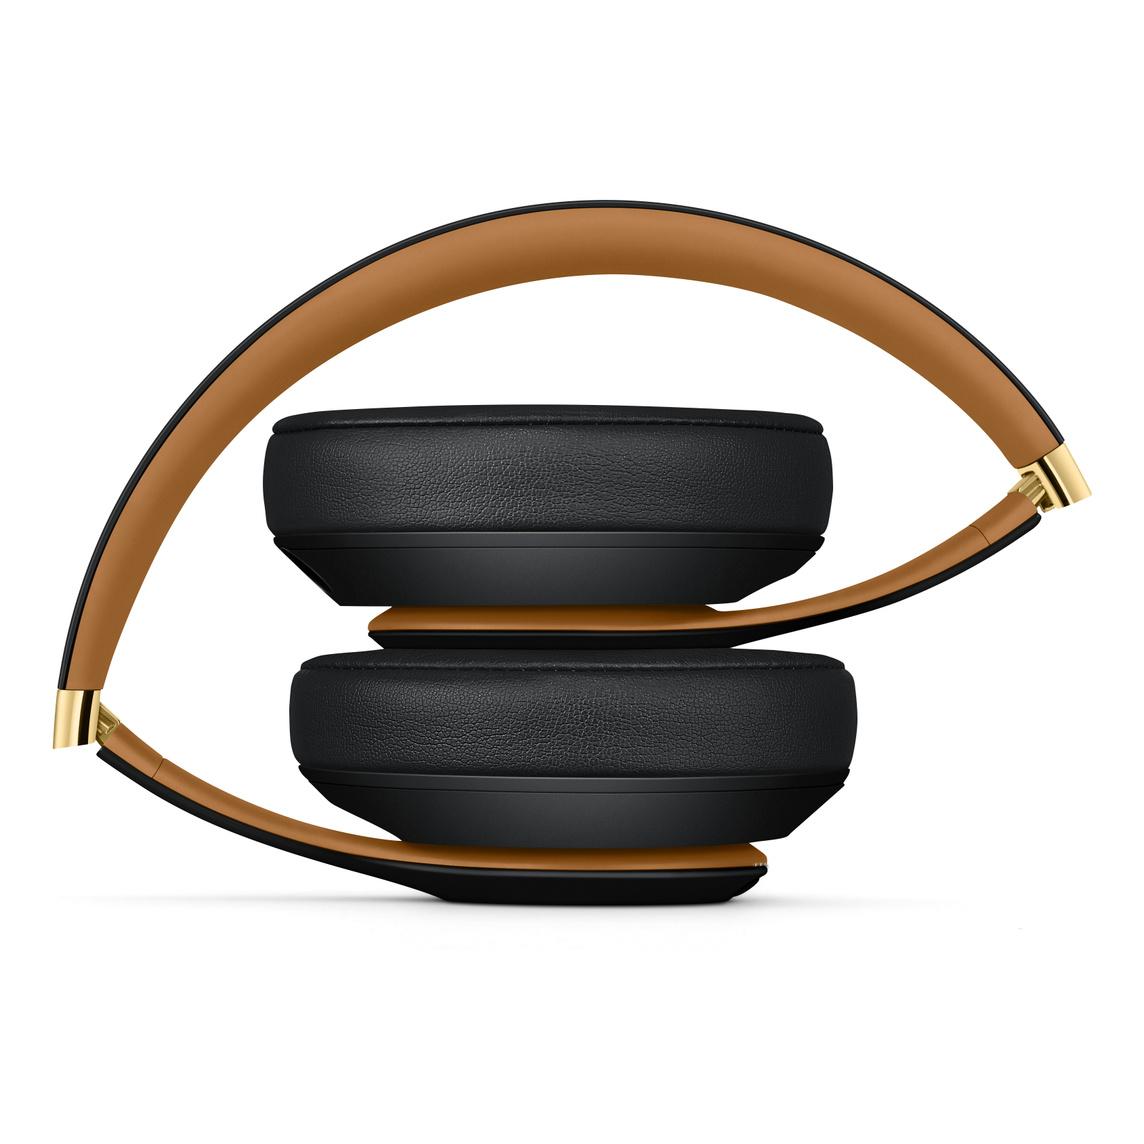 Beats Studio3 Wireless Over Ear Headphones The Beats Skyline Collection Midnight Black Apple